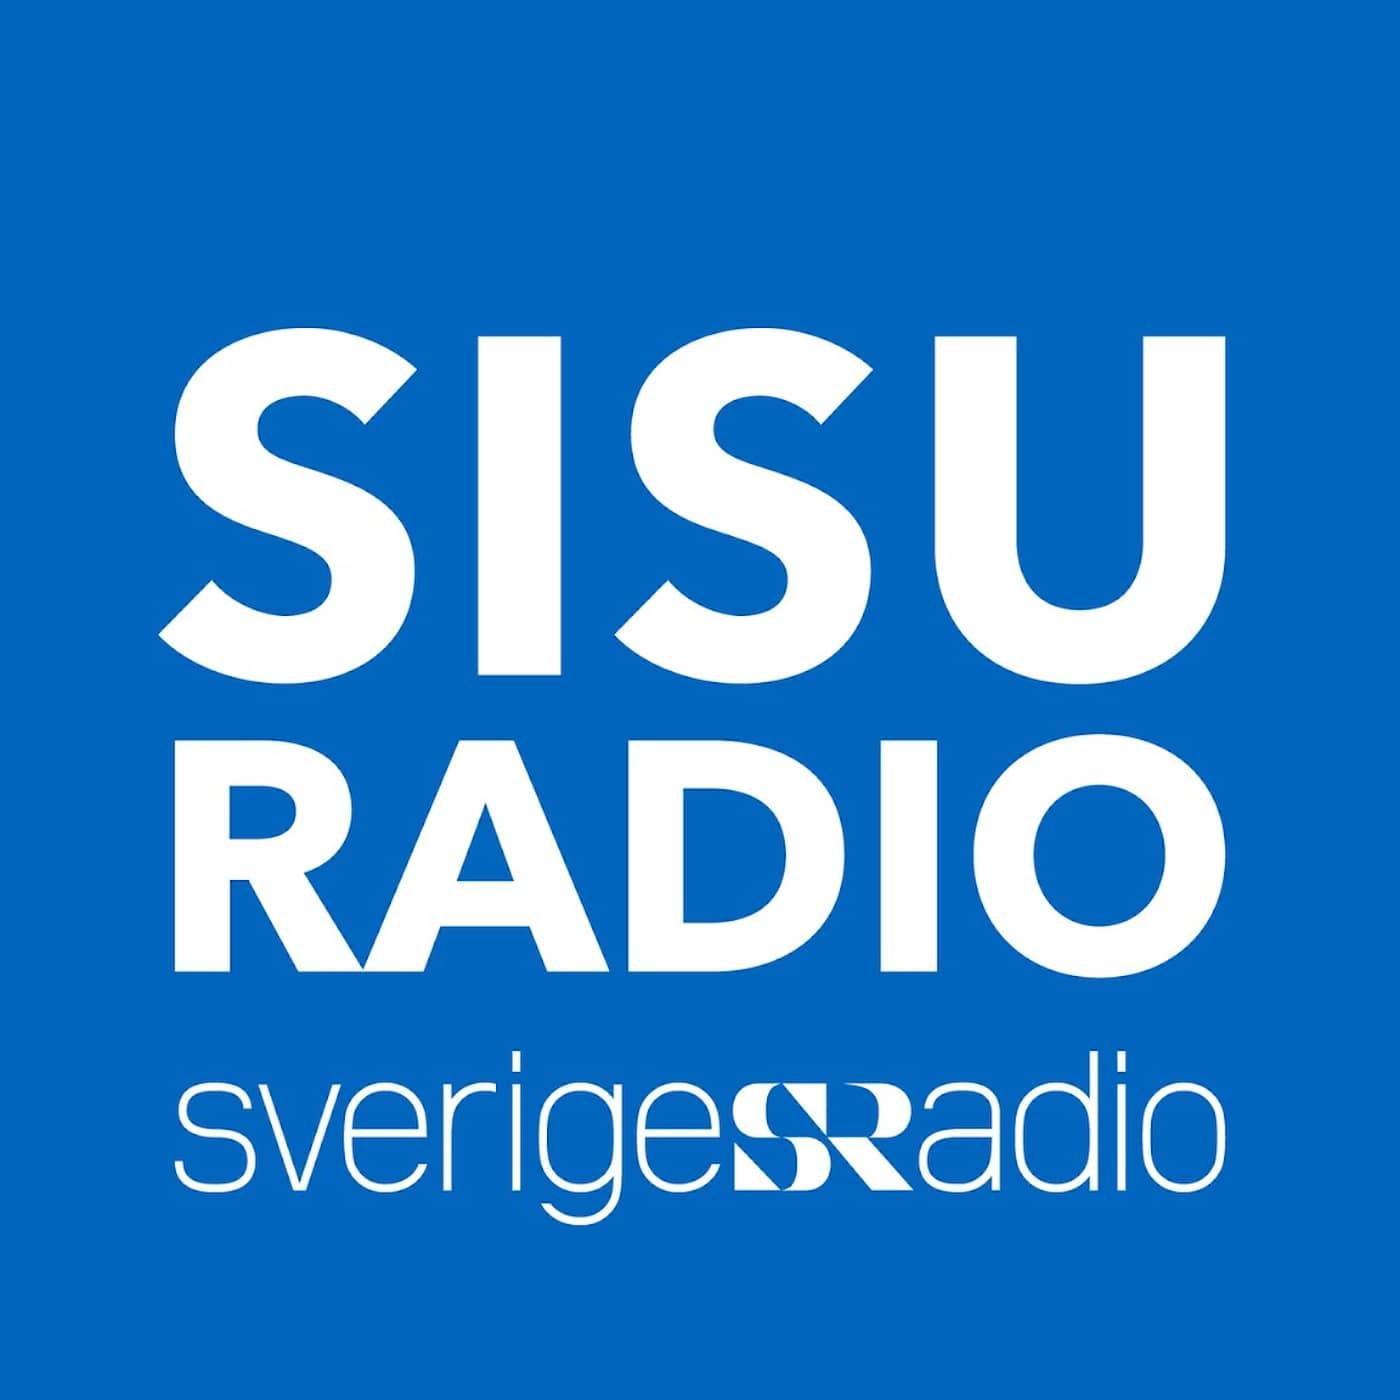 Studio Sisu